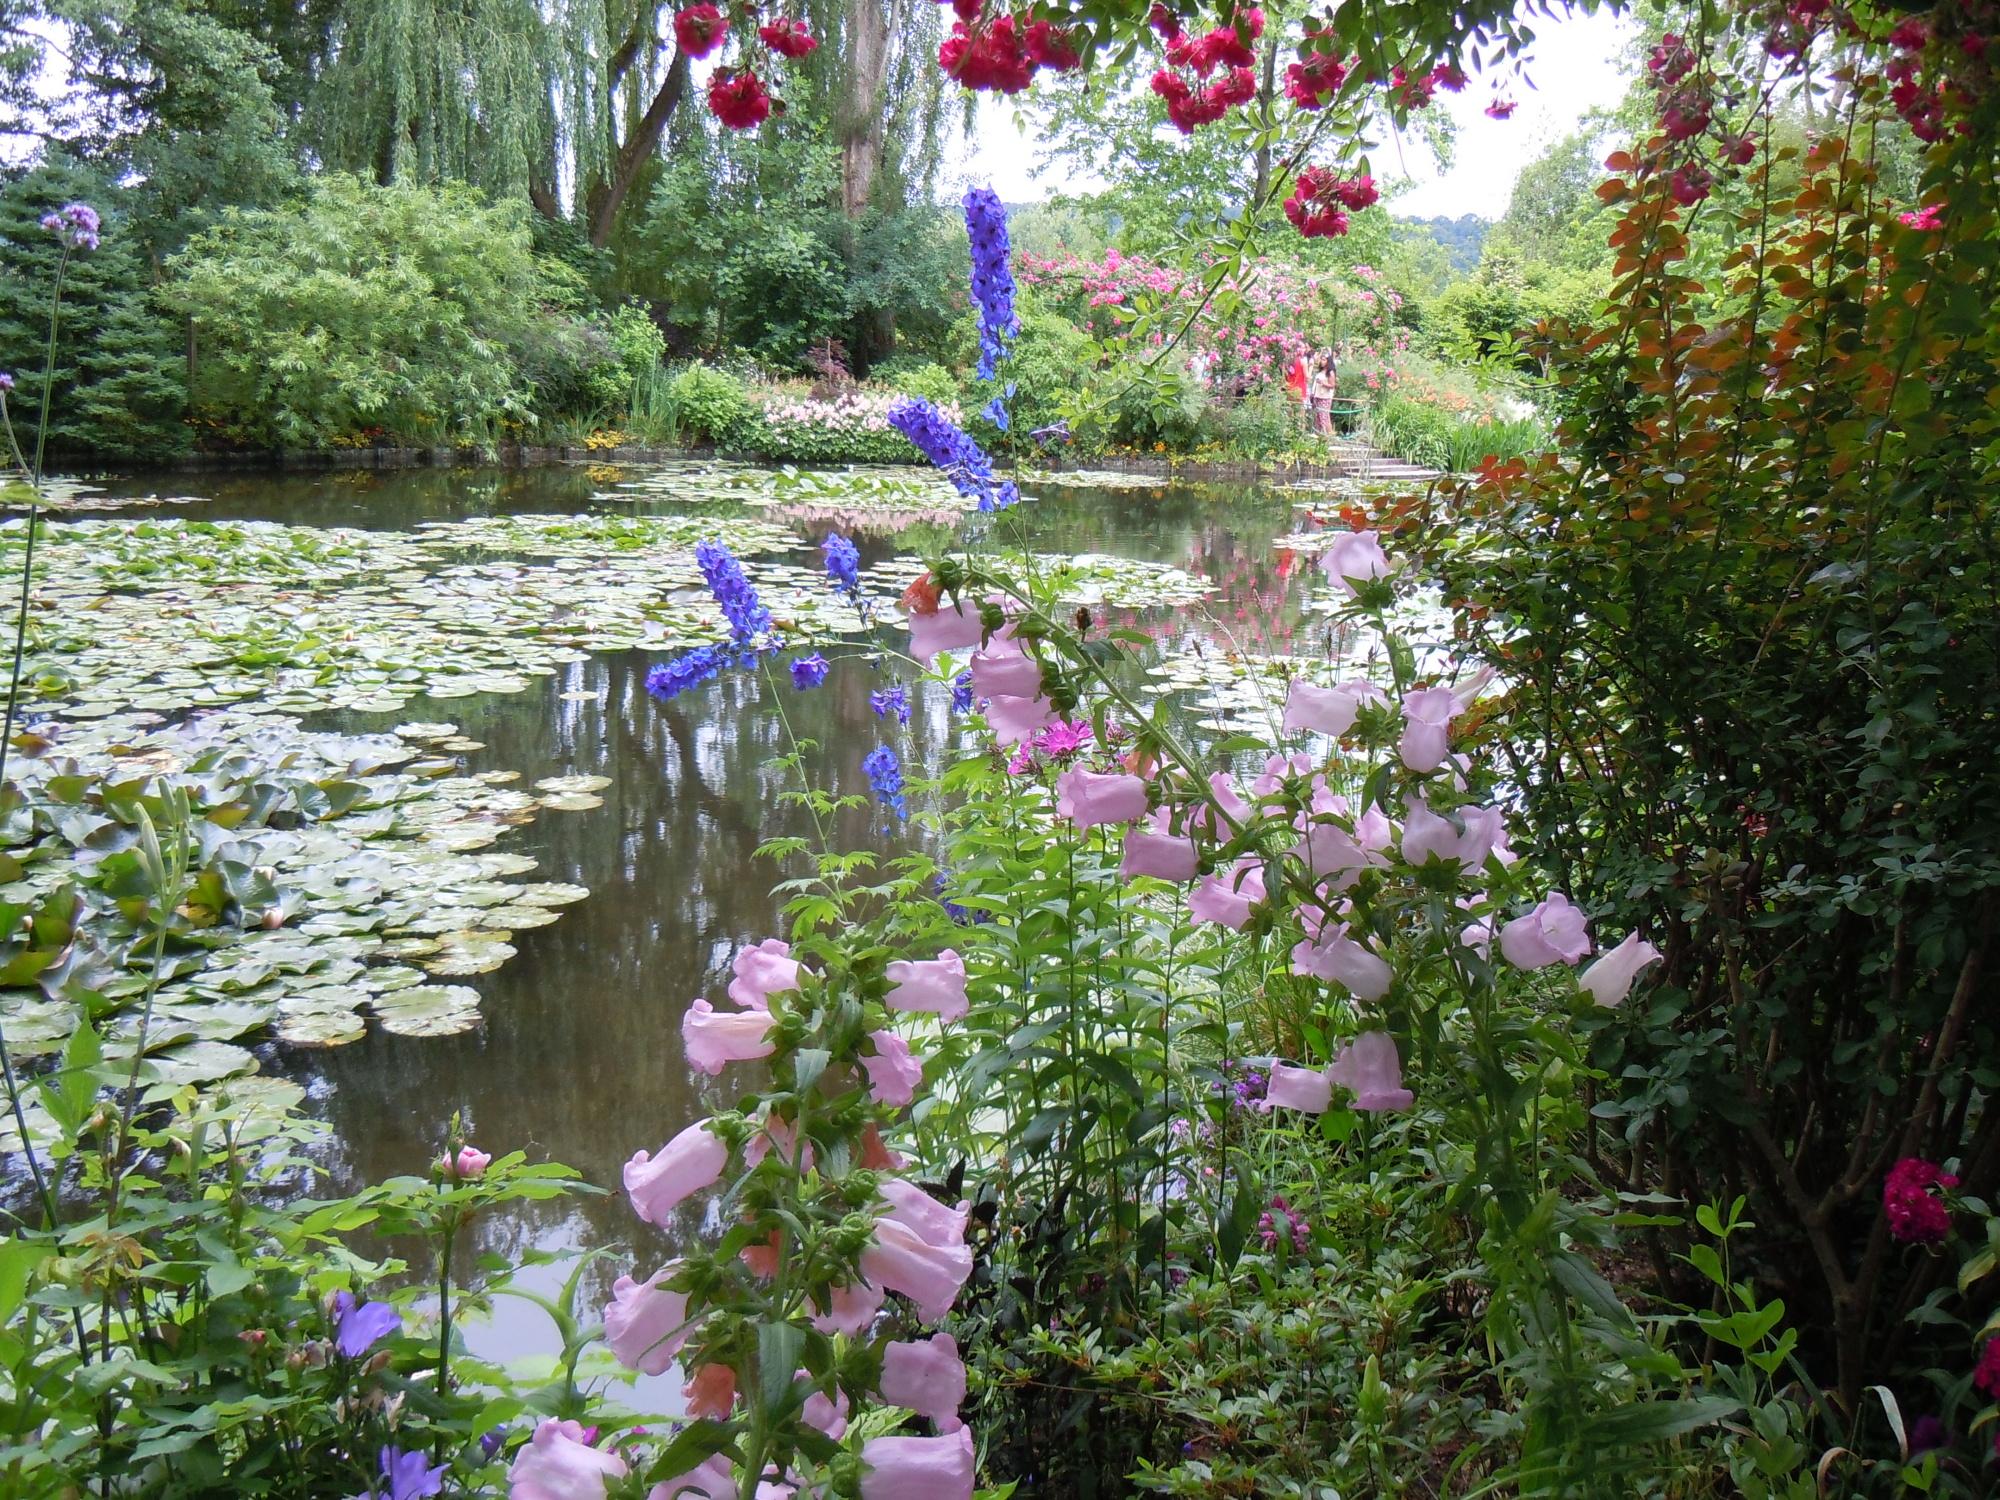 Claude Monet's Lily Pond